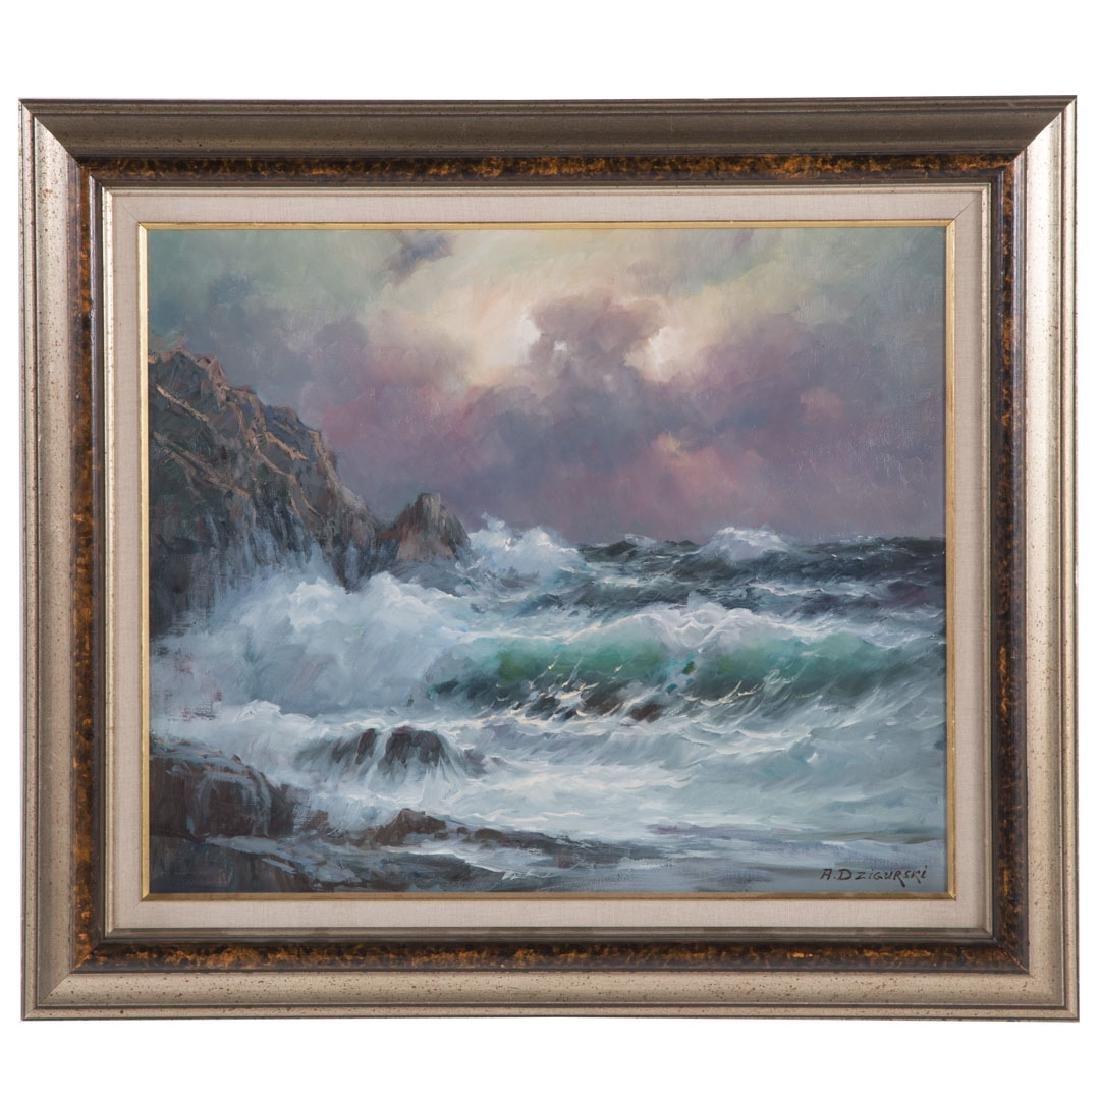 Alexander Dzigurski. Coastal Seascape, oil